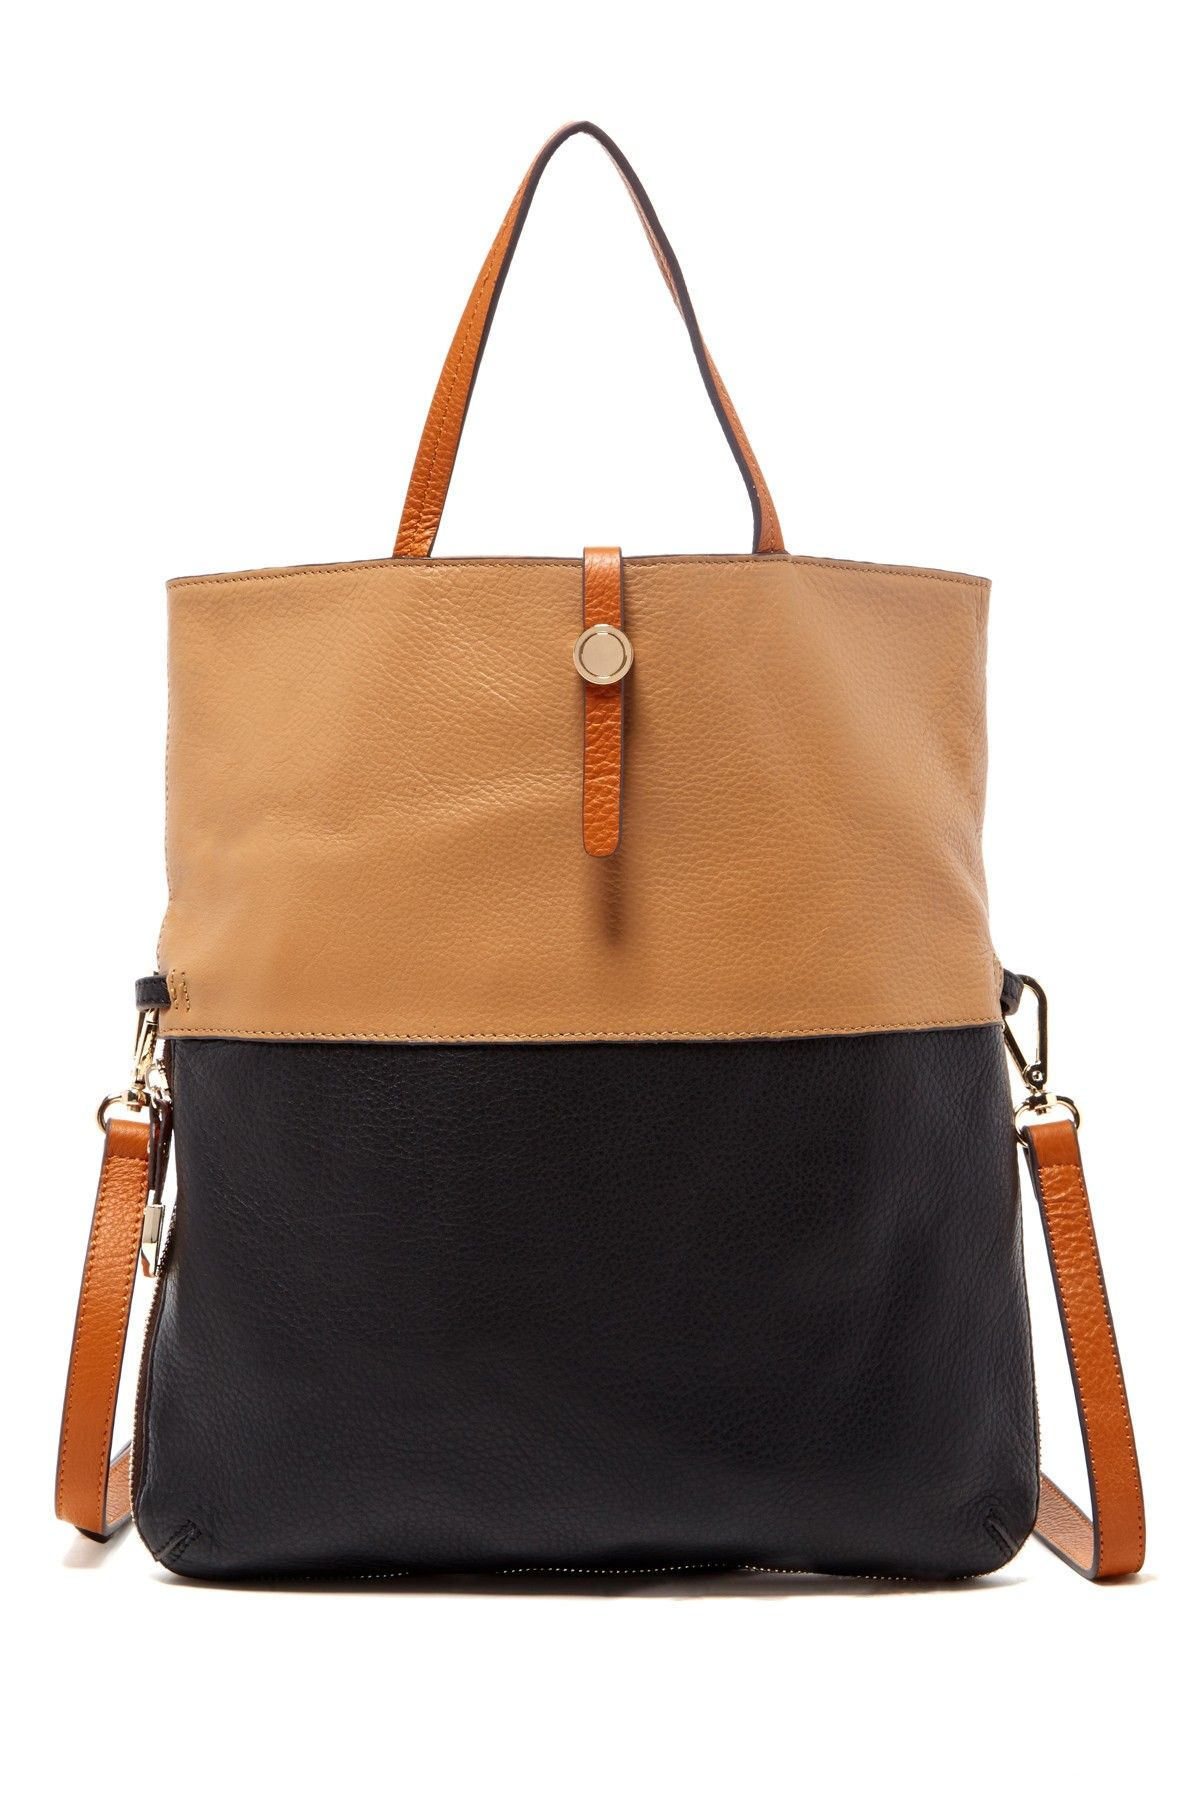 Charles David Handbags Veronique Handbag On Hautelook